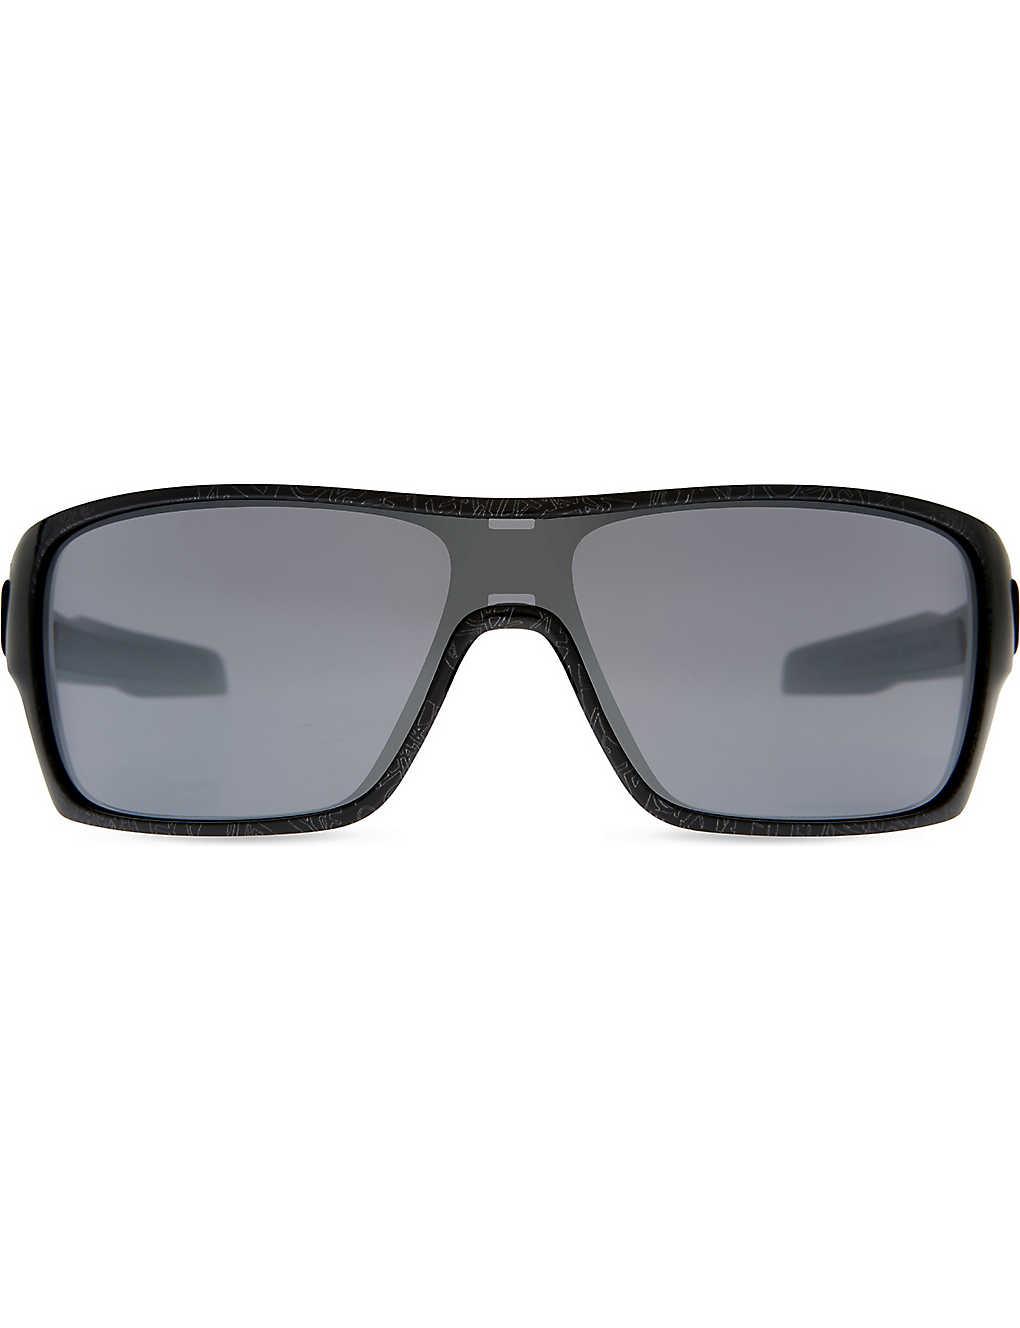 OAKLEY - OO9307 Turbine Rotor square-frame sunglasses  69b8389bc9